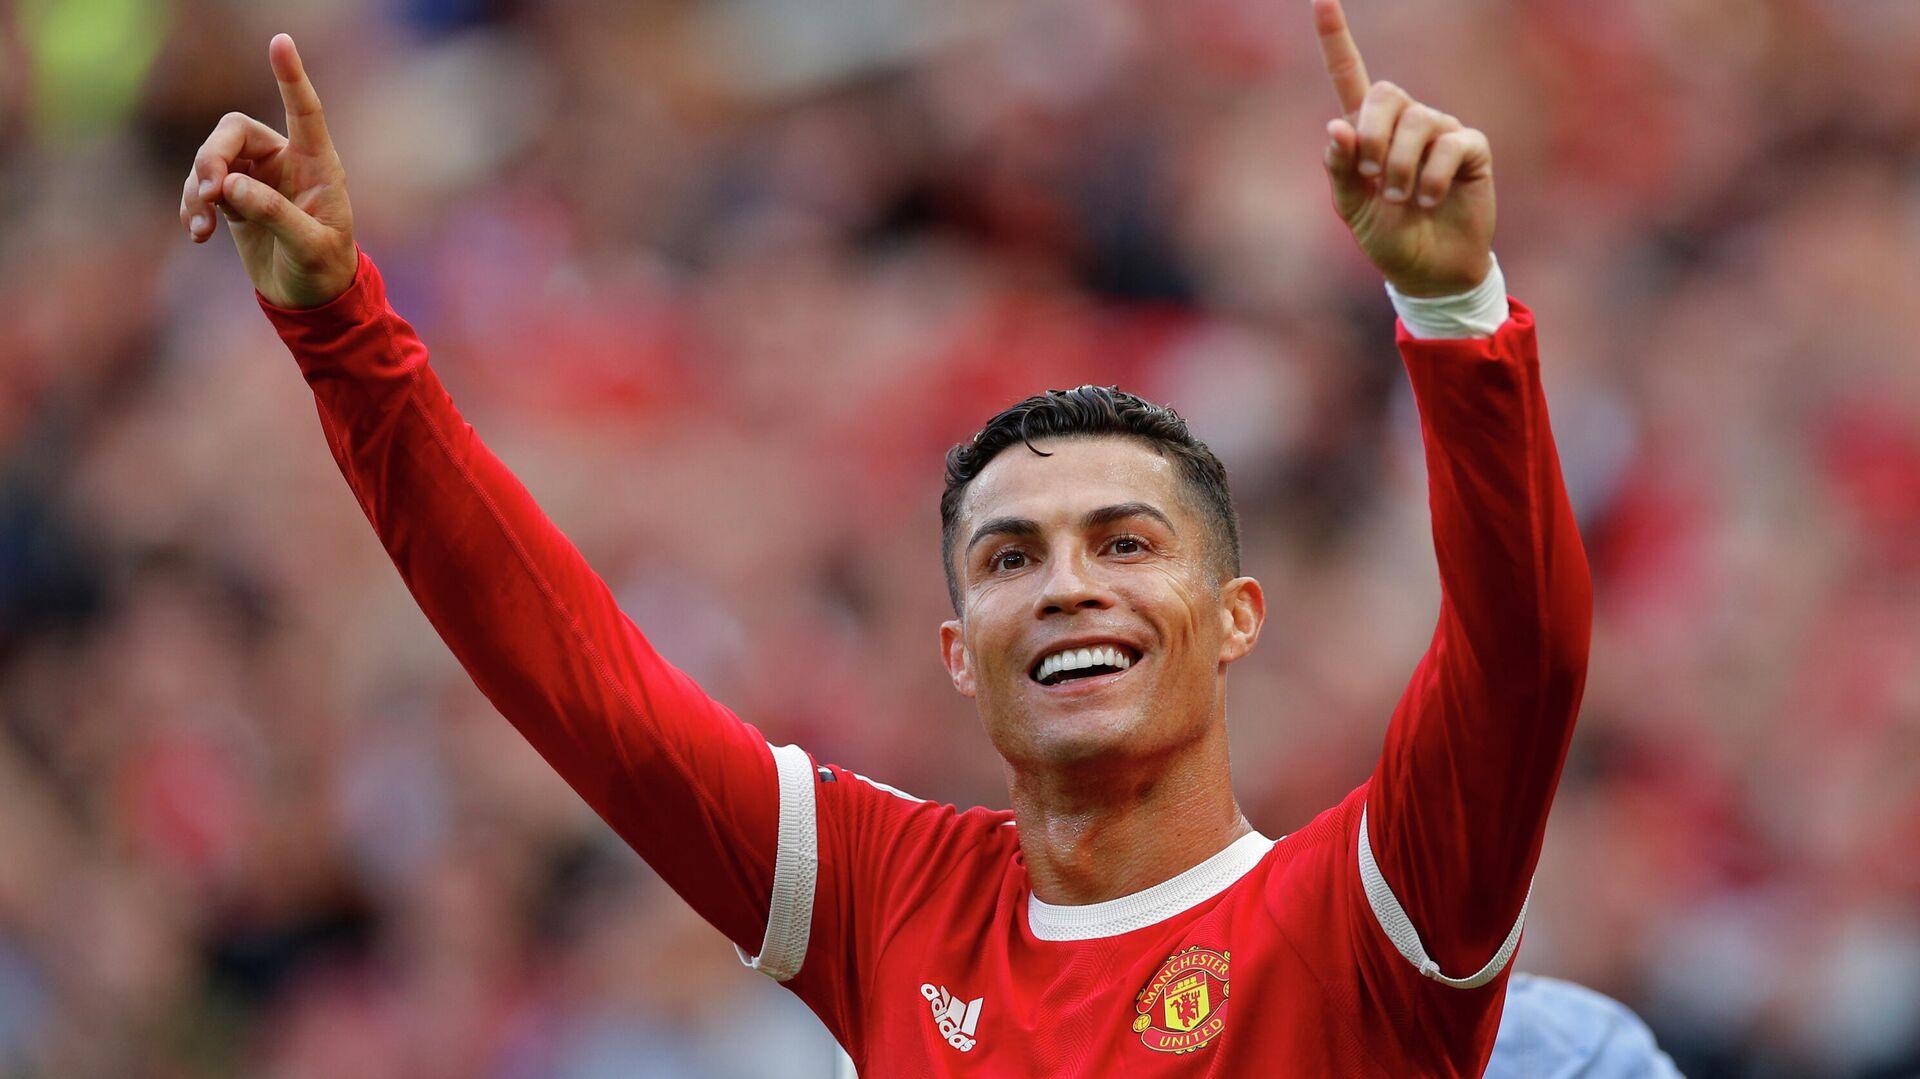 Manchester United's Cristiano Ronaldo celebrates scoring their second goal  - Sputnik International, 1920, 12.09.2021